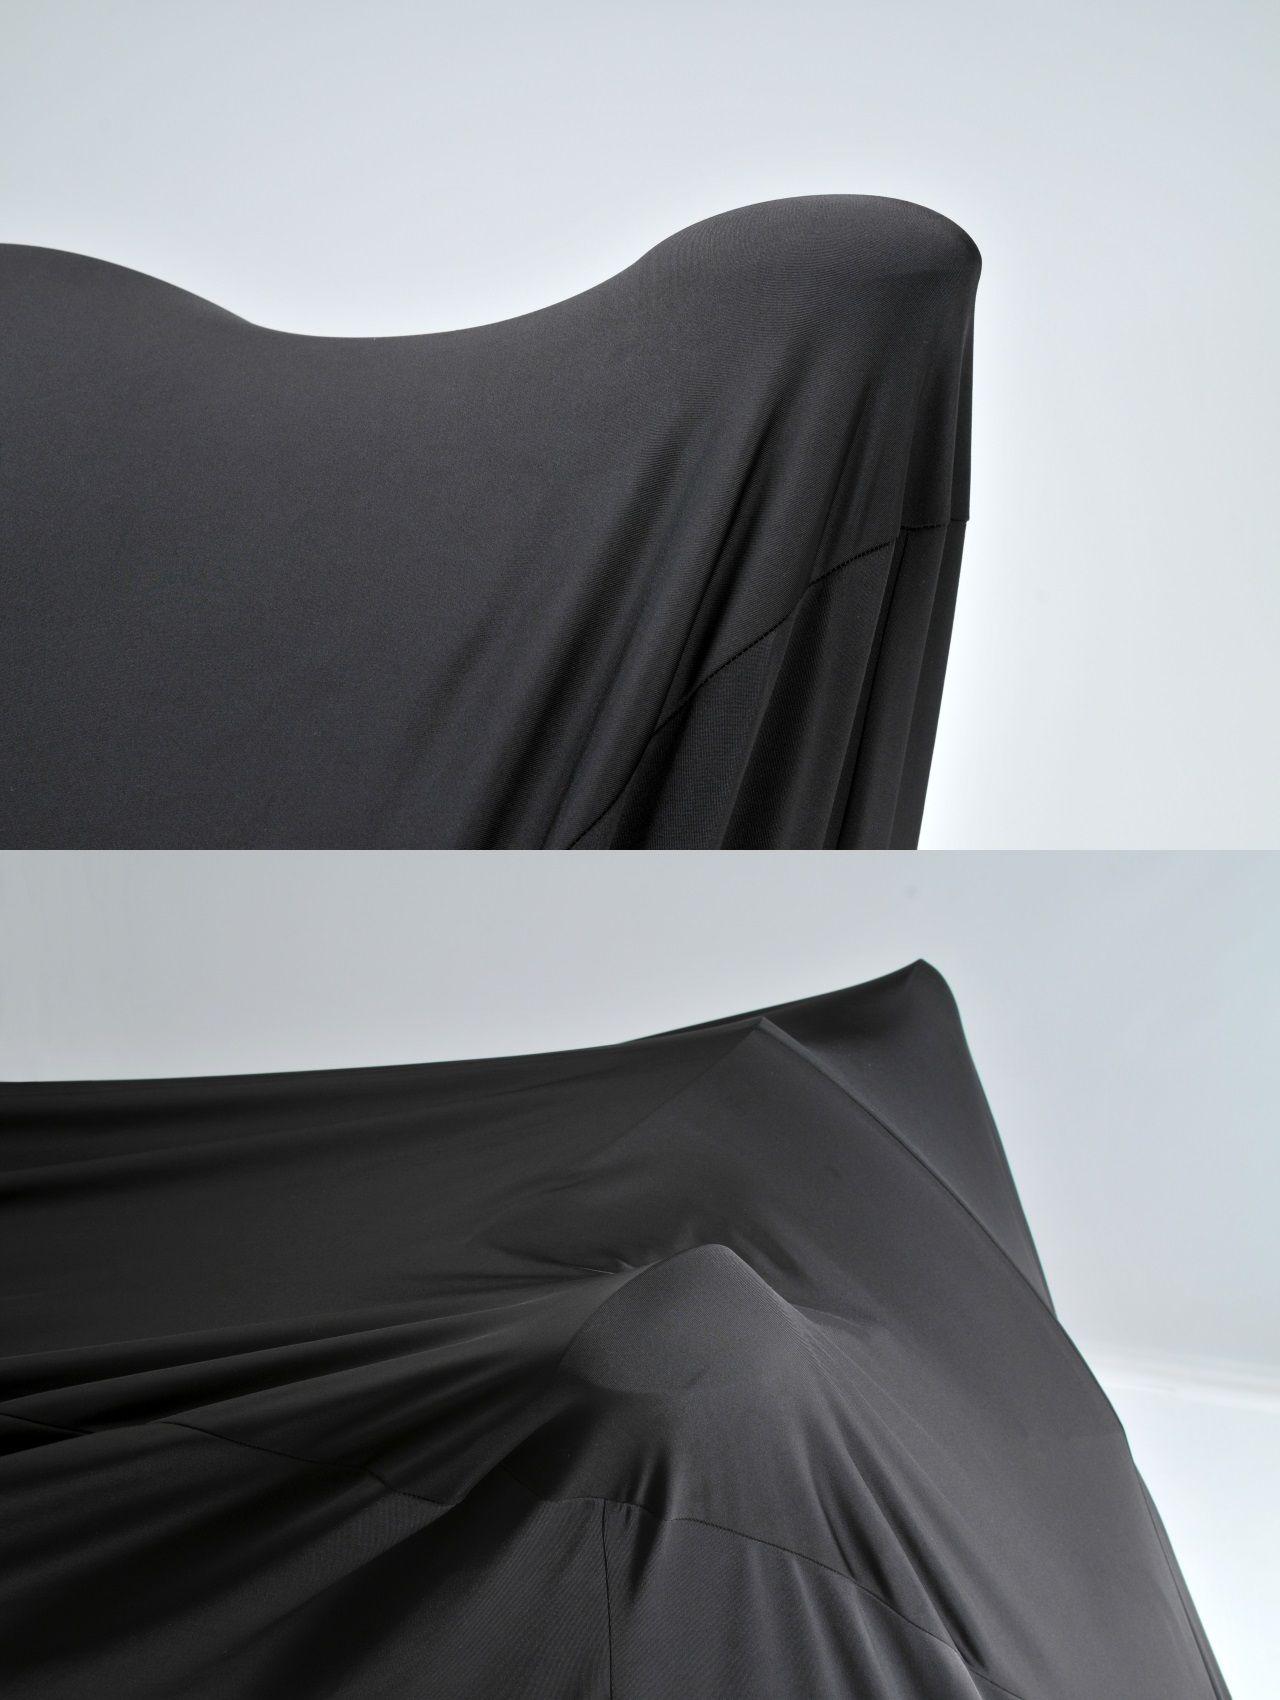 【山城】Profit Inner Force摩托車罩 - 「Webike-摩托百貨」